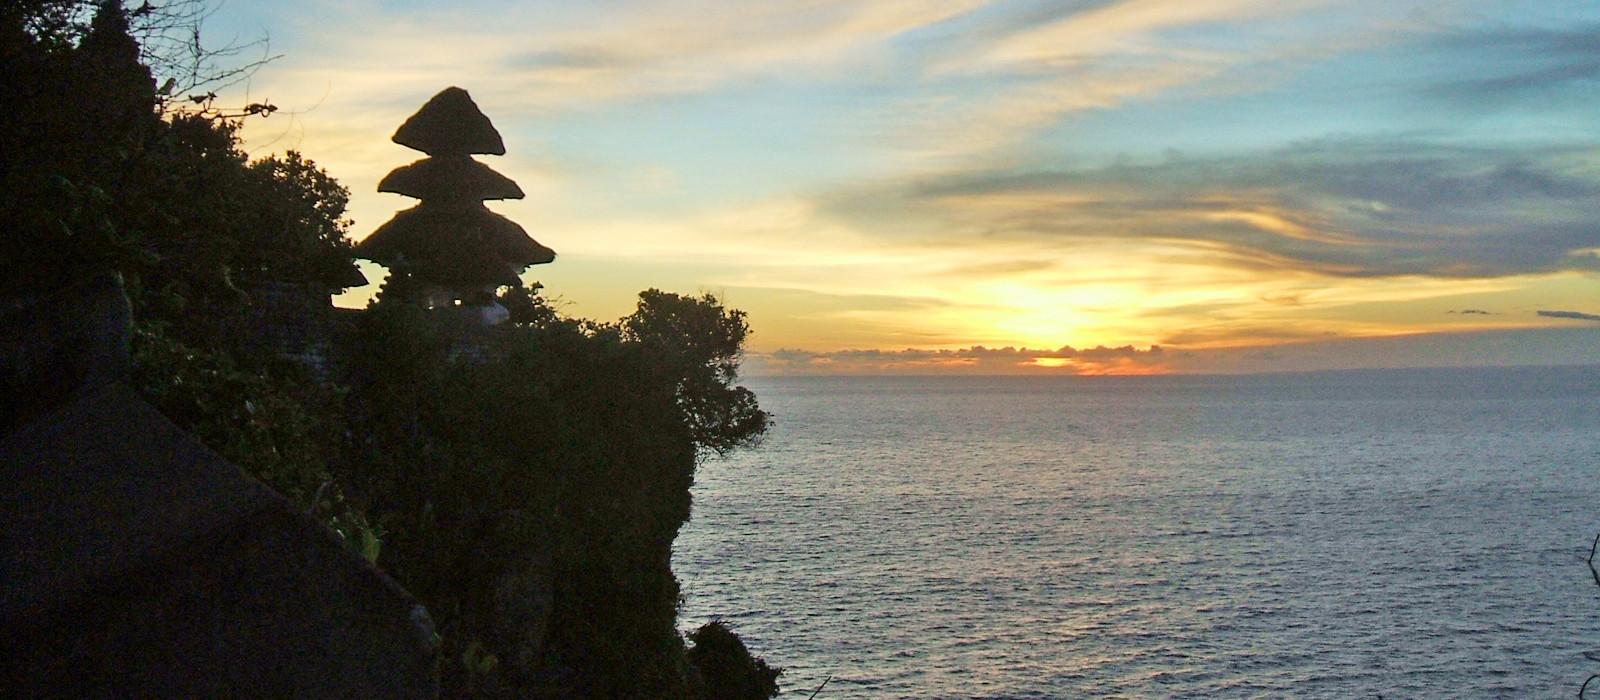 Reiseziel Bali,Uluwatu Indonesien